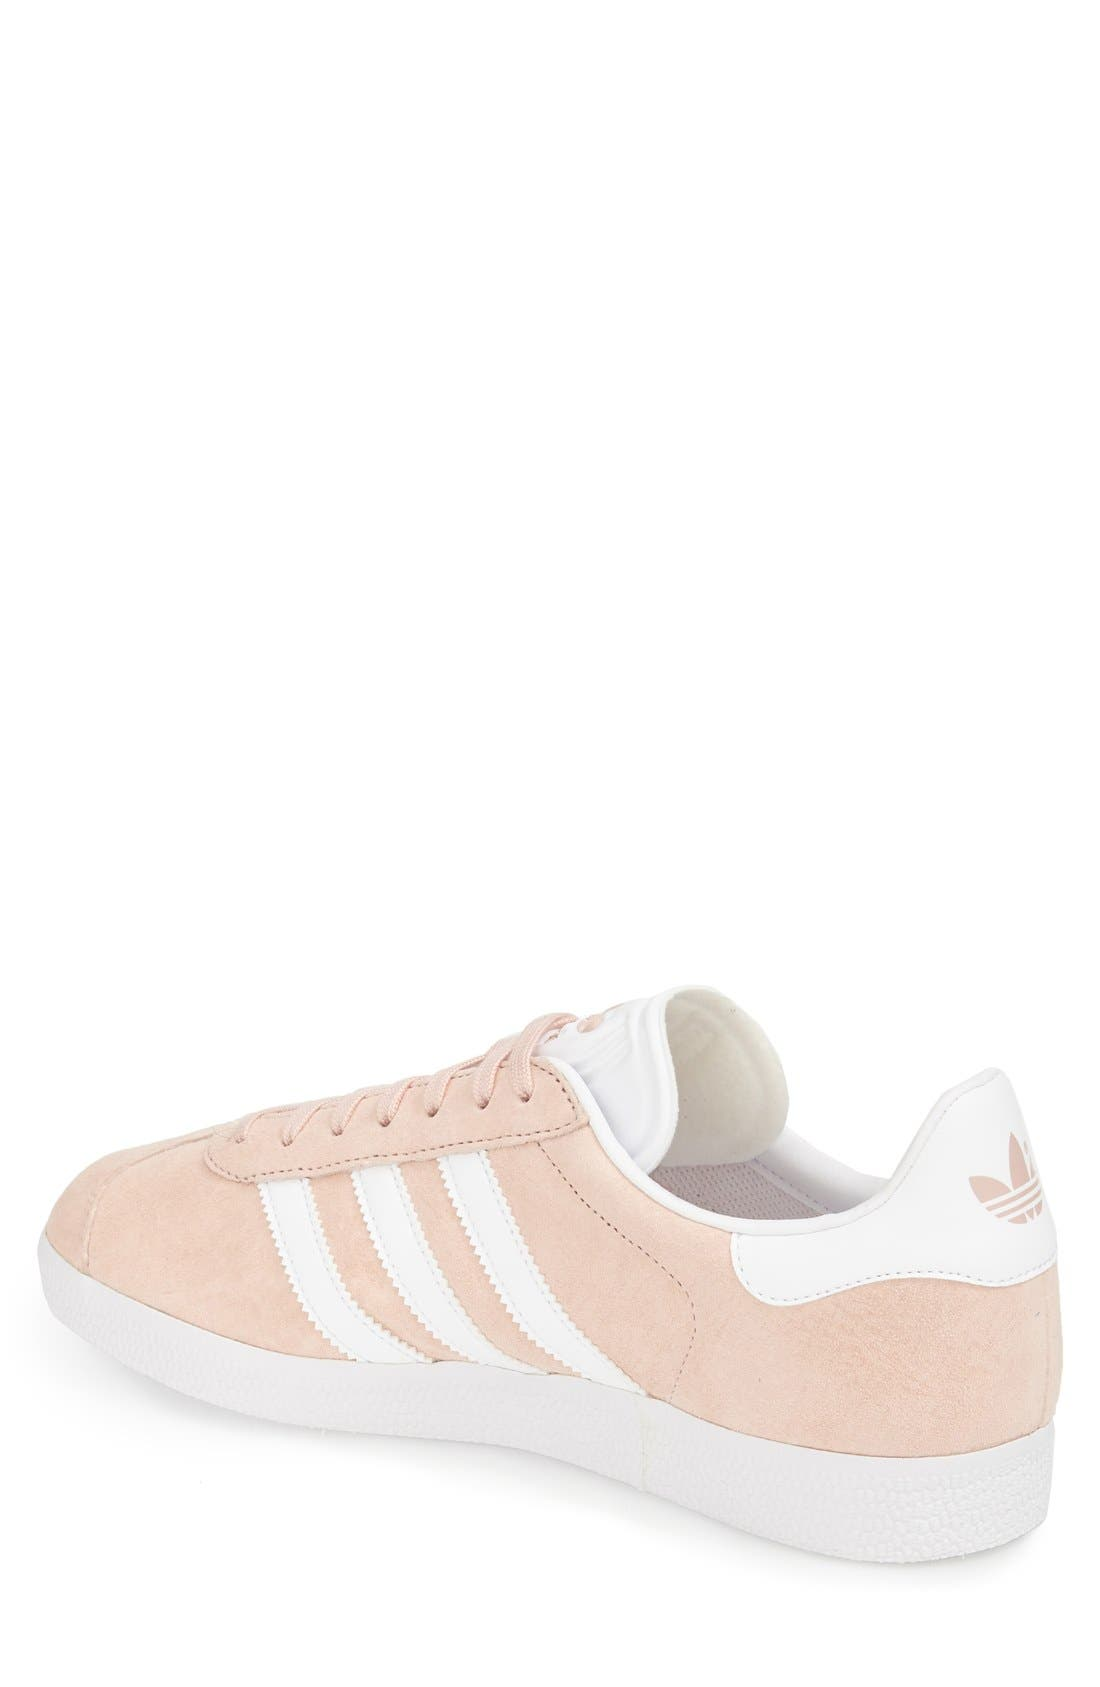 Gazelle Sneaker,                             Alternate thumbnail 2, color,                             Vapor Pink